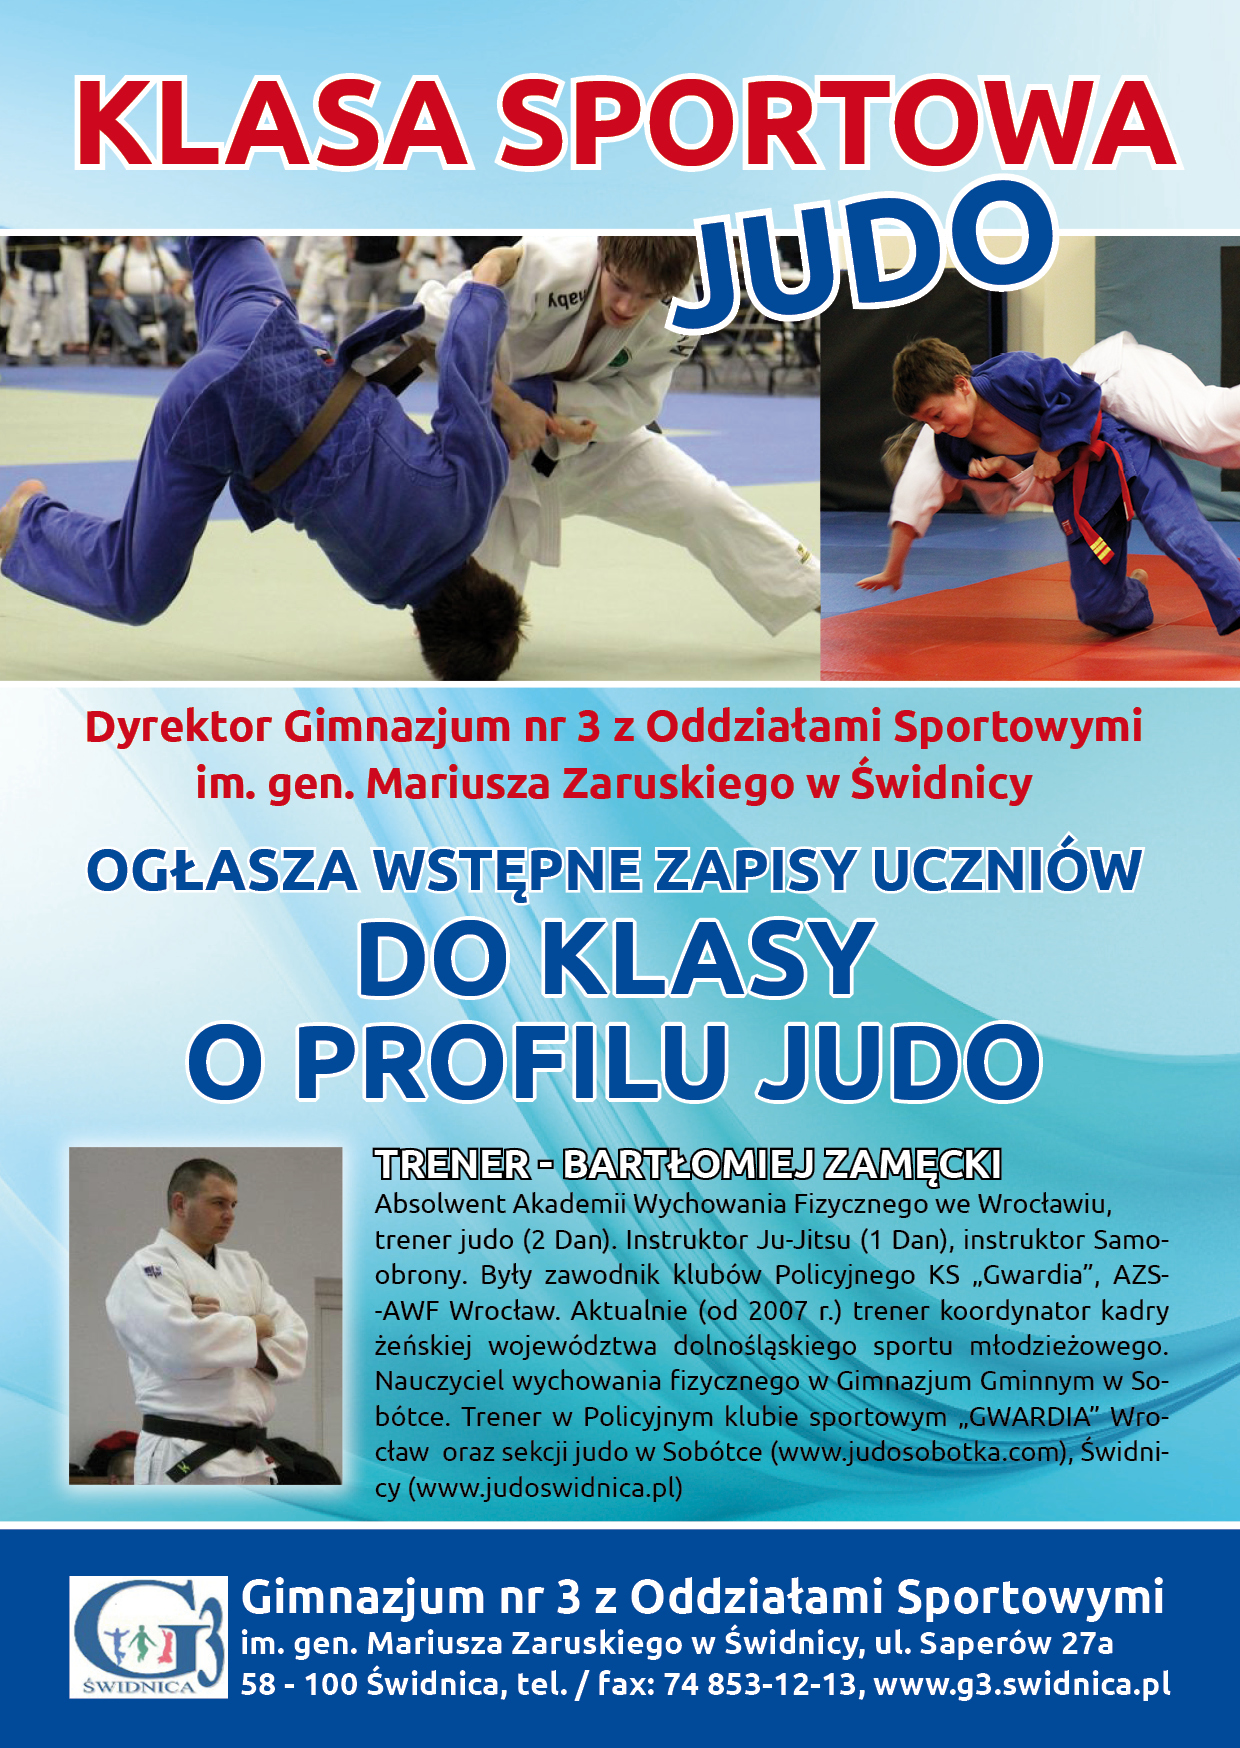 Rusza klasa sportowa o profilu judo